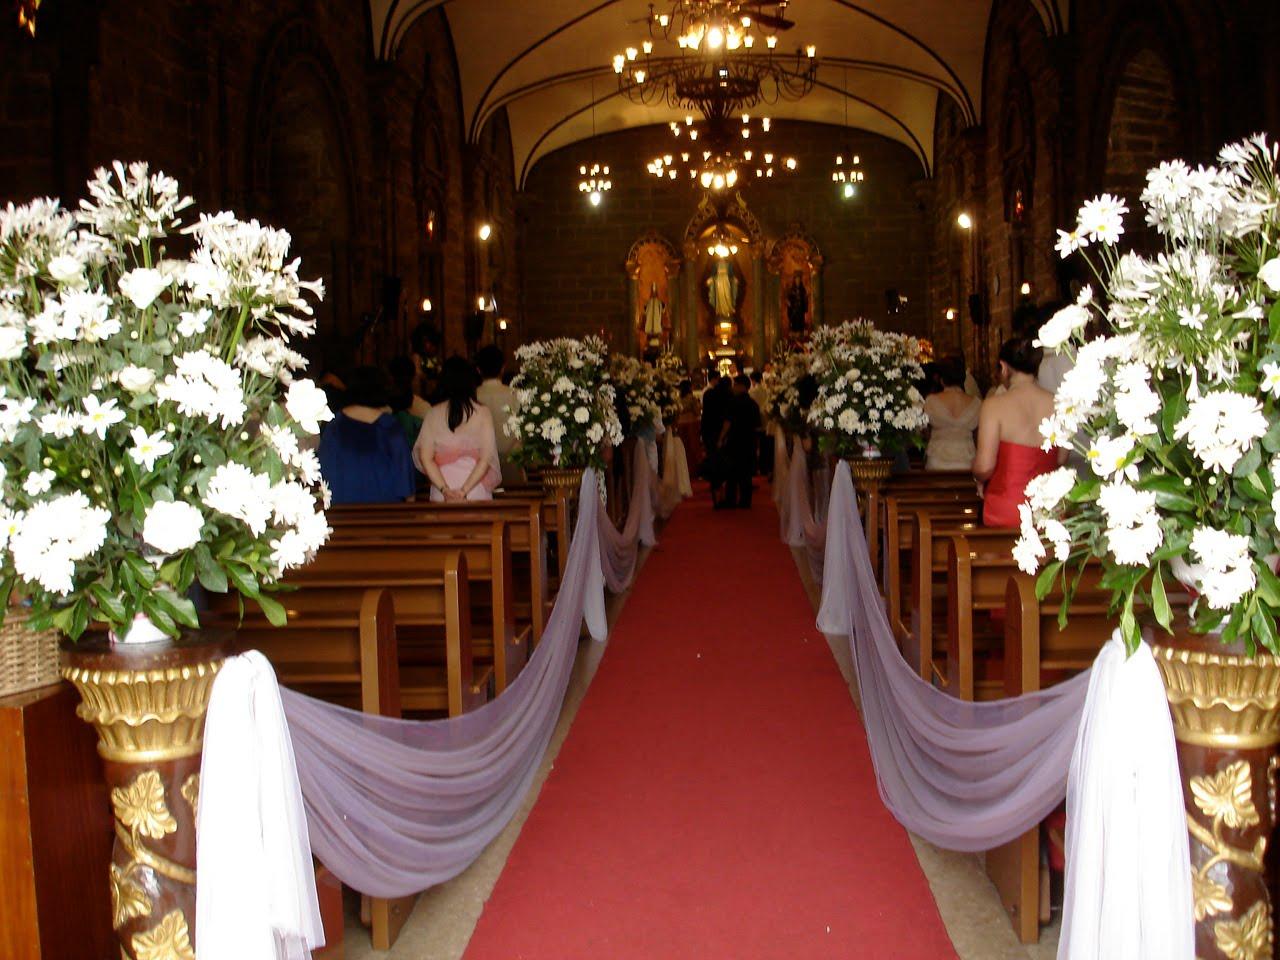 Marva's Blog: Church Wedding Decor